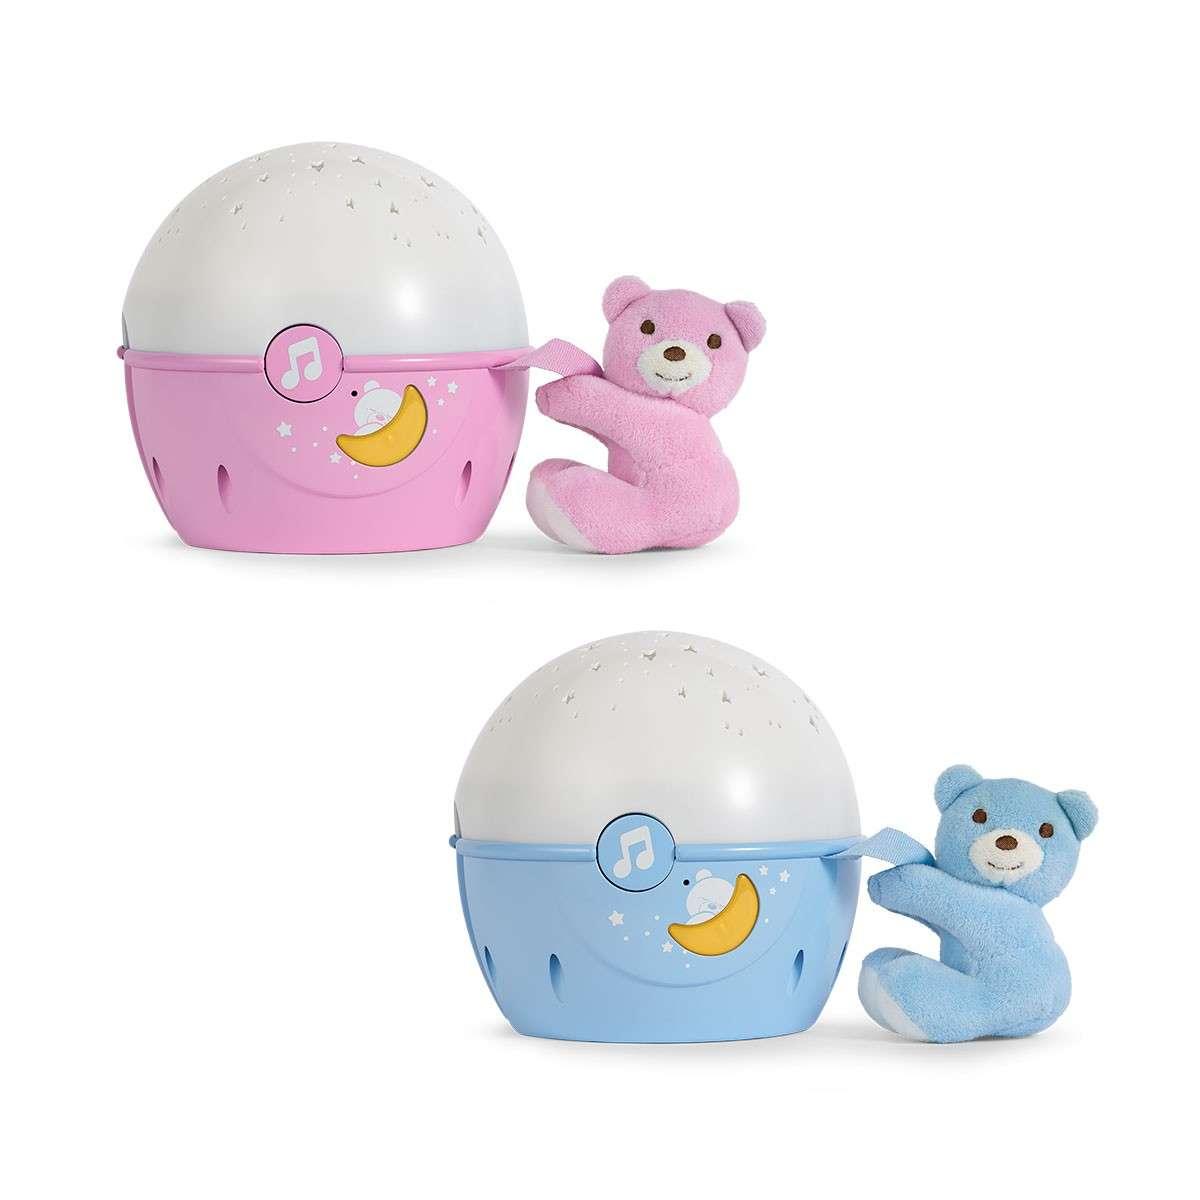 Next2stars Baby Night Light Projector Toys Chicco Uk